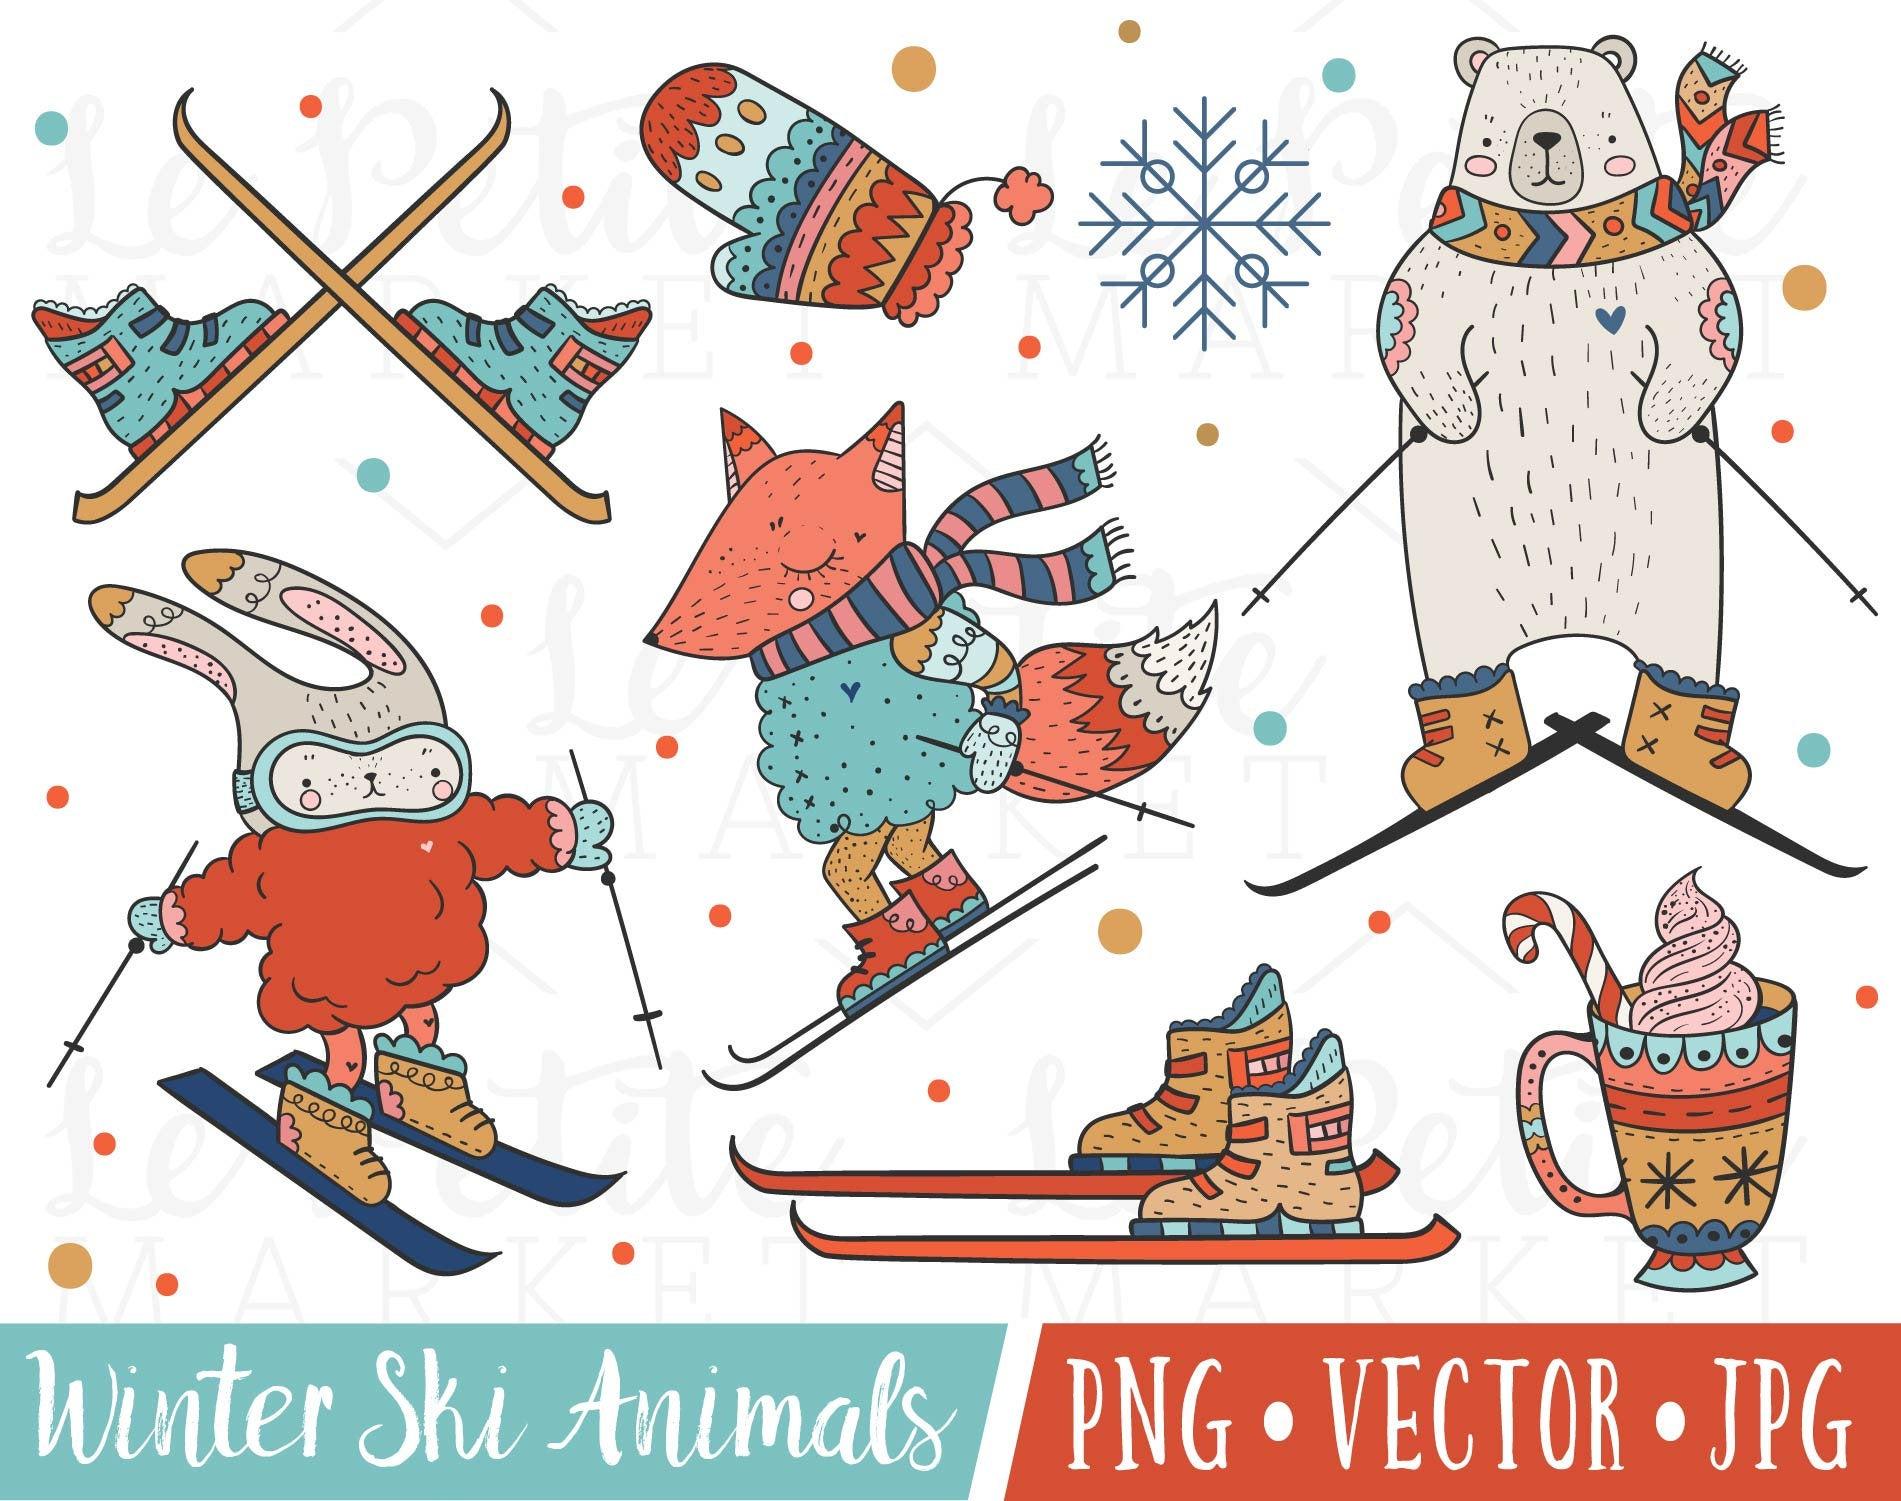 Cute Winter Animals Clipart, Cute Ski Clipart, Skiing Animals Clipart,  Polar Bear Clipart, Winter Fox Clipart, Outdoor Winter Sports Clipart.